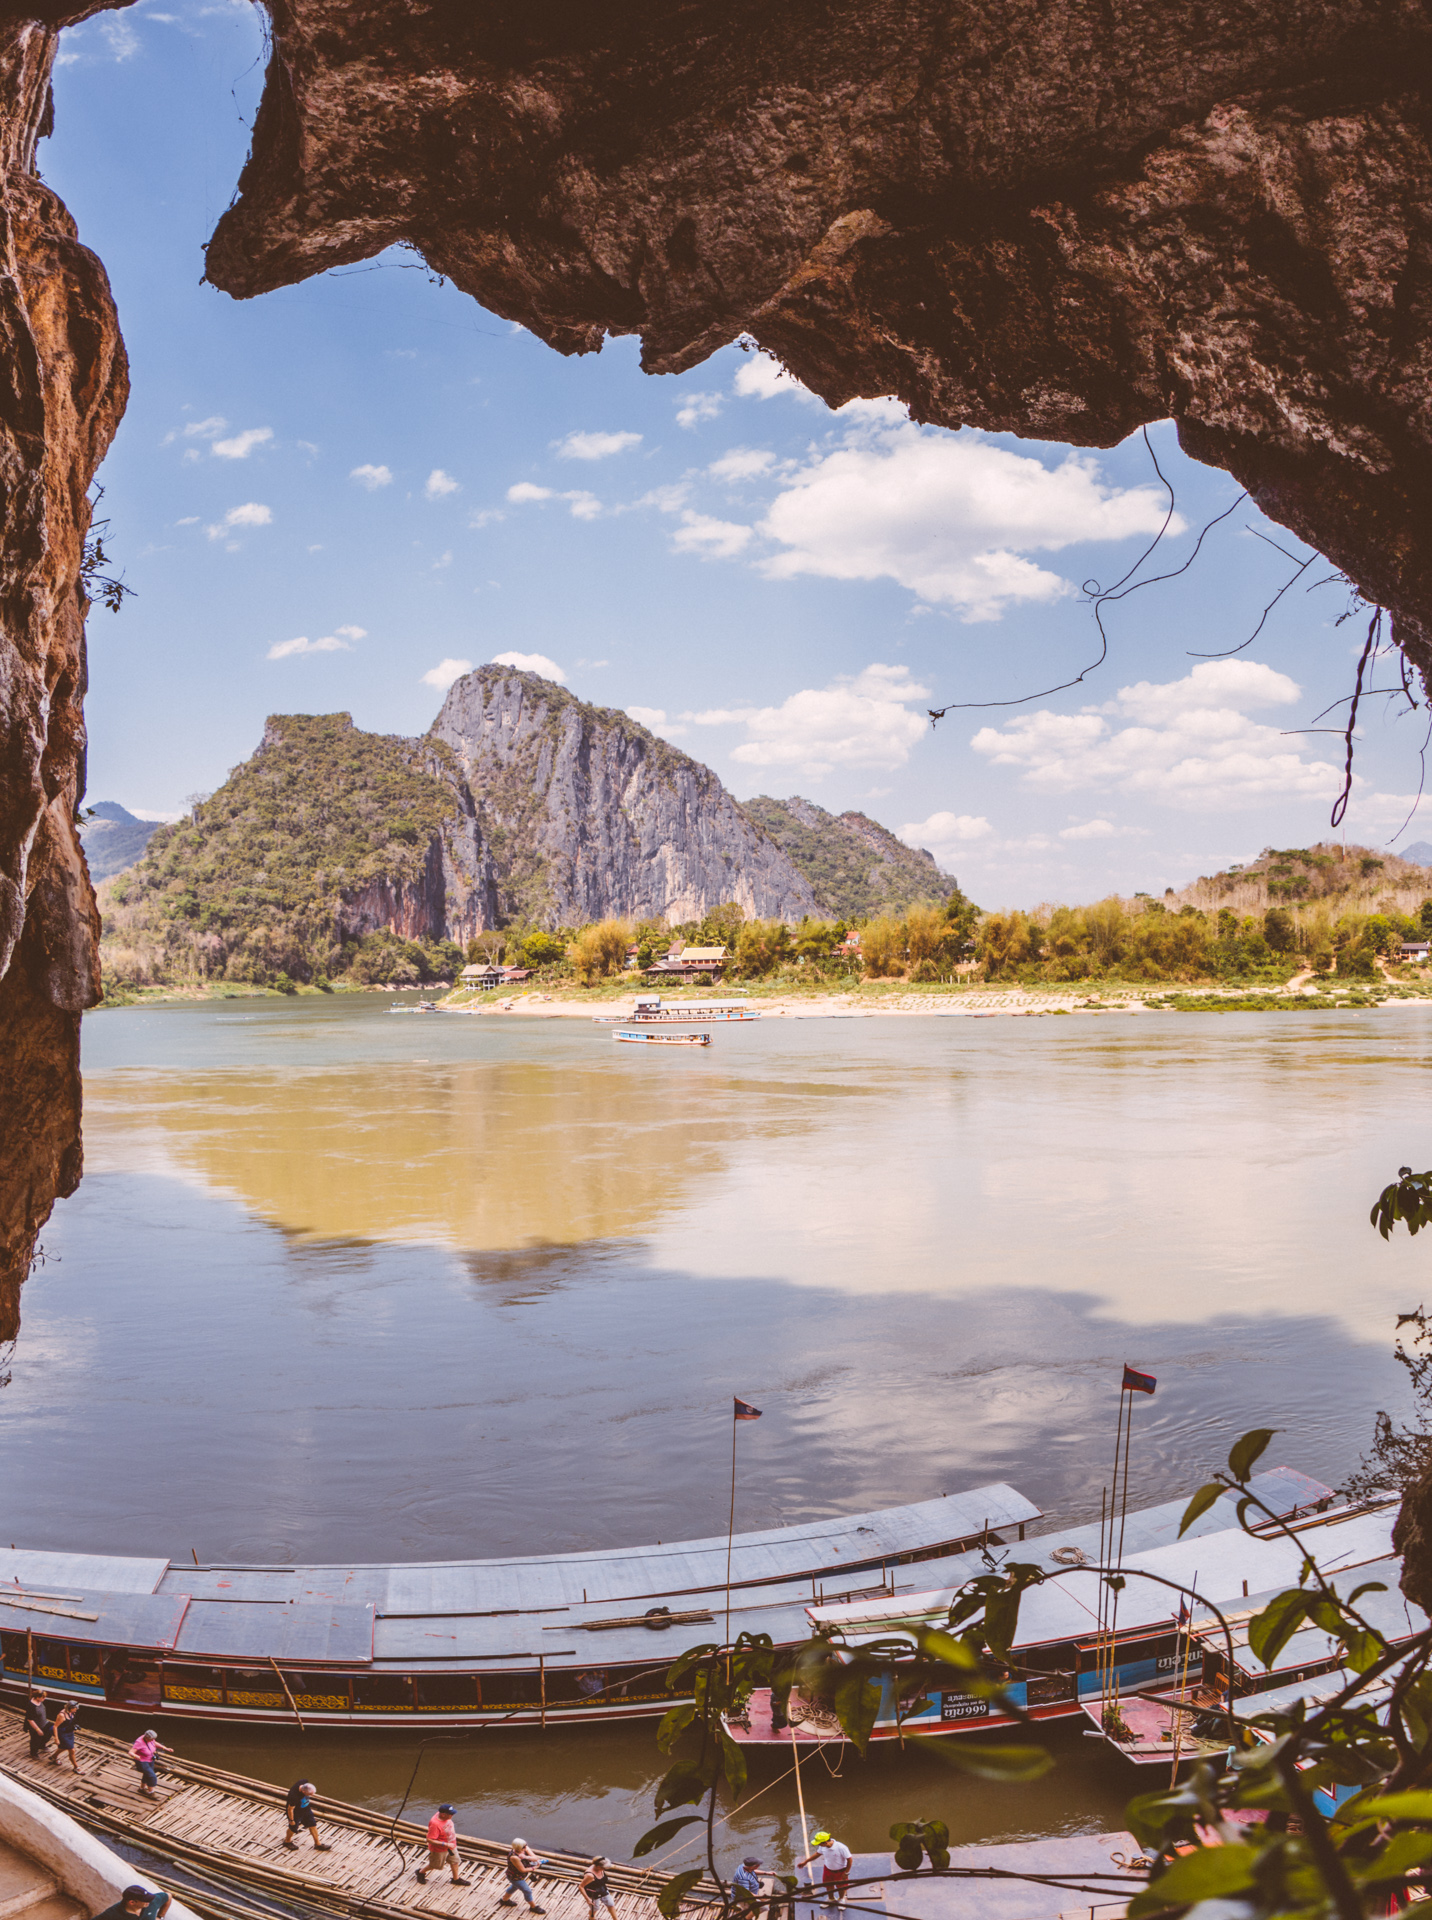 Pak Ou Caves Mekong River Hole